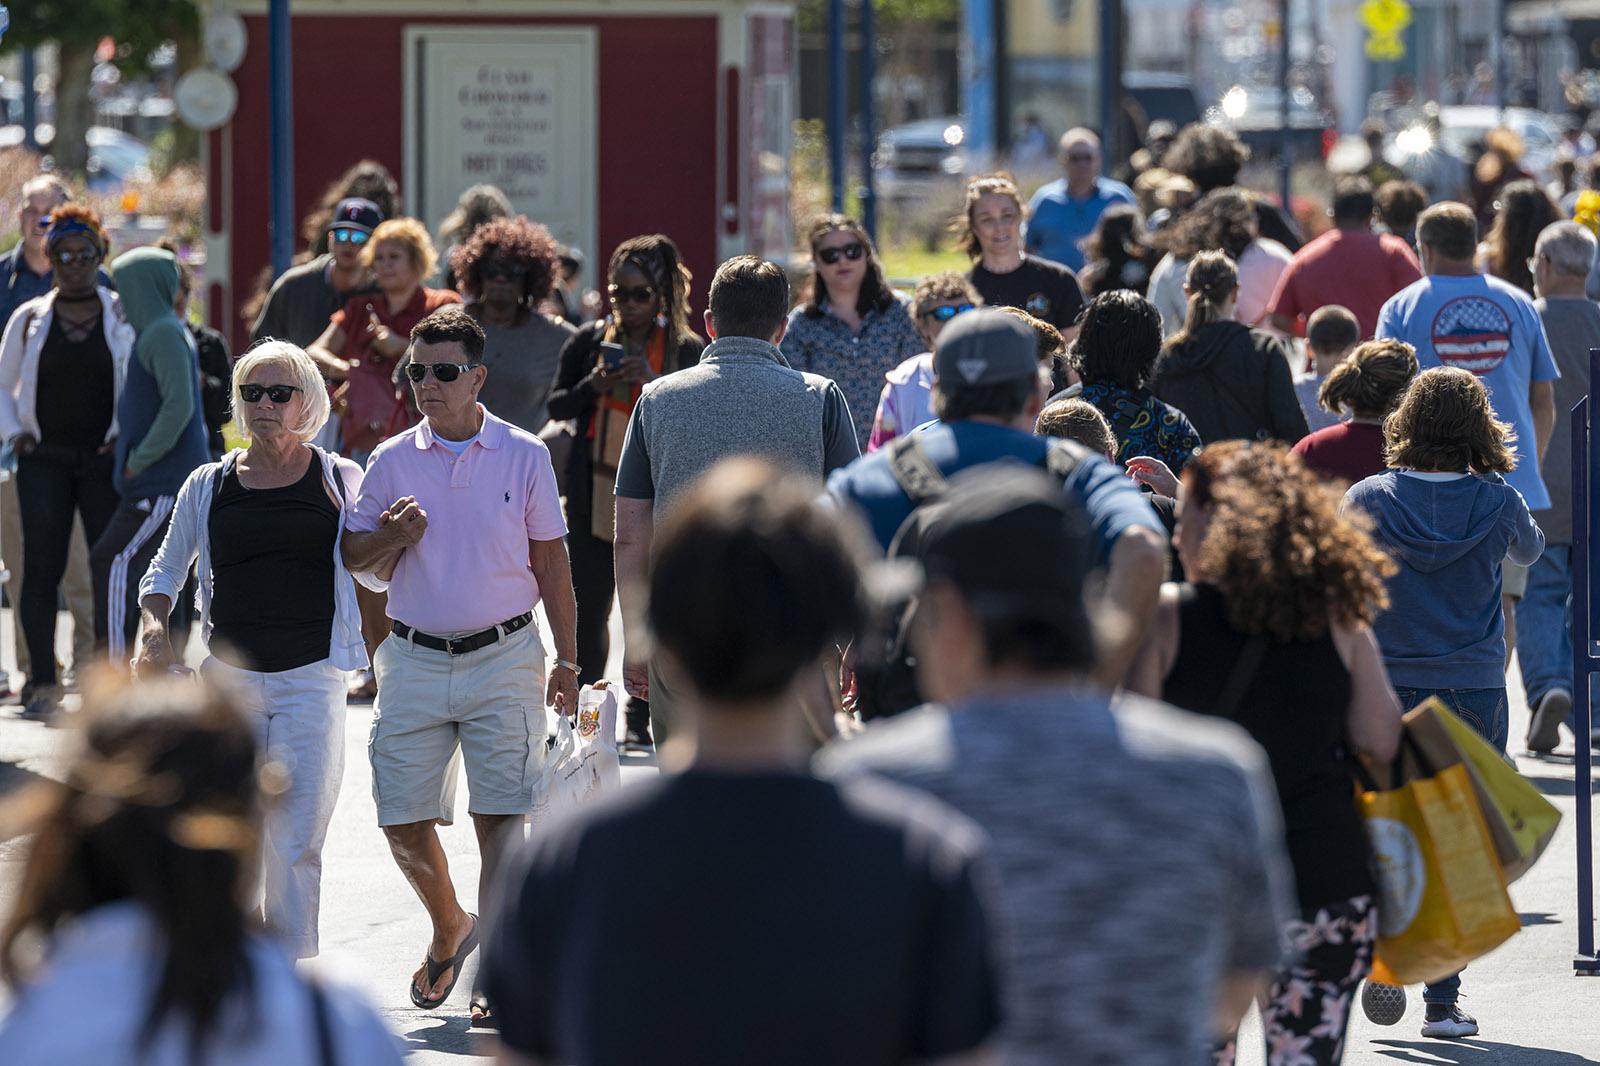 People walk on Fishermans Wharf in San Francisco, California, on June 15, 2021.